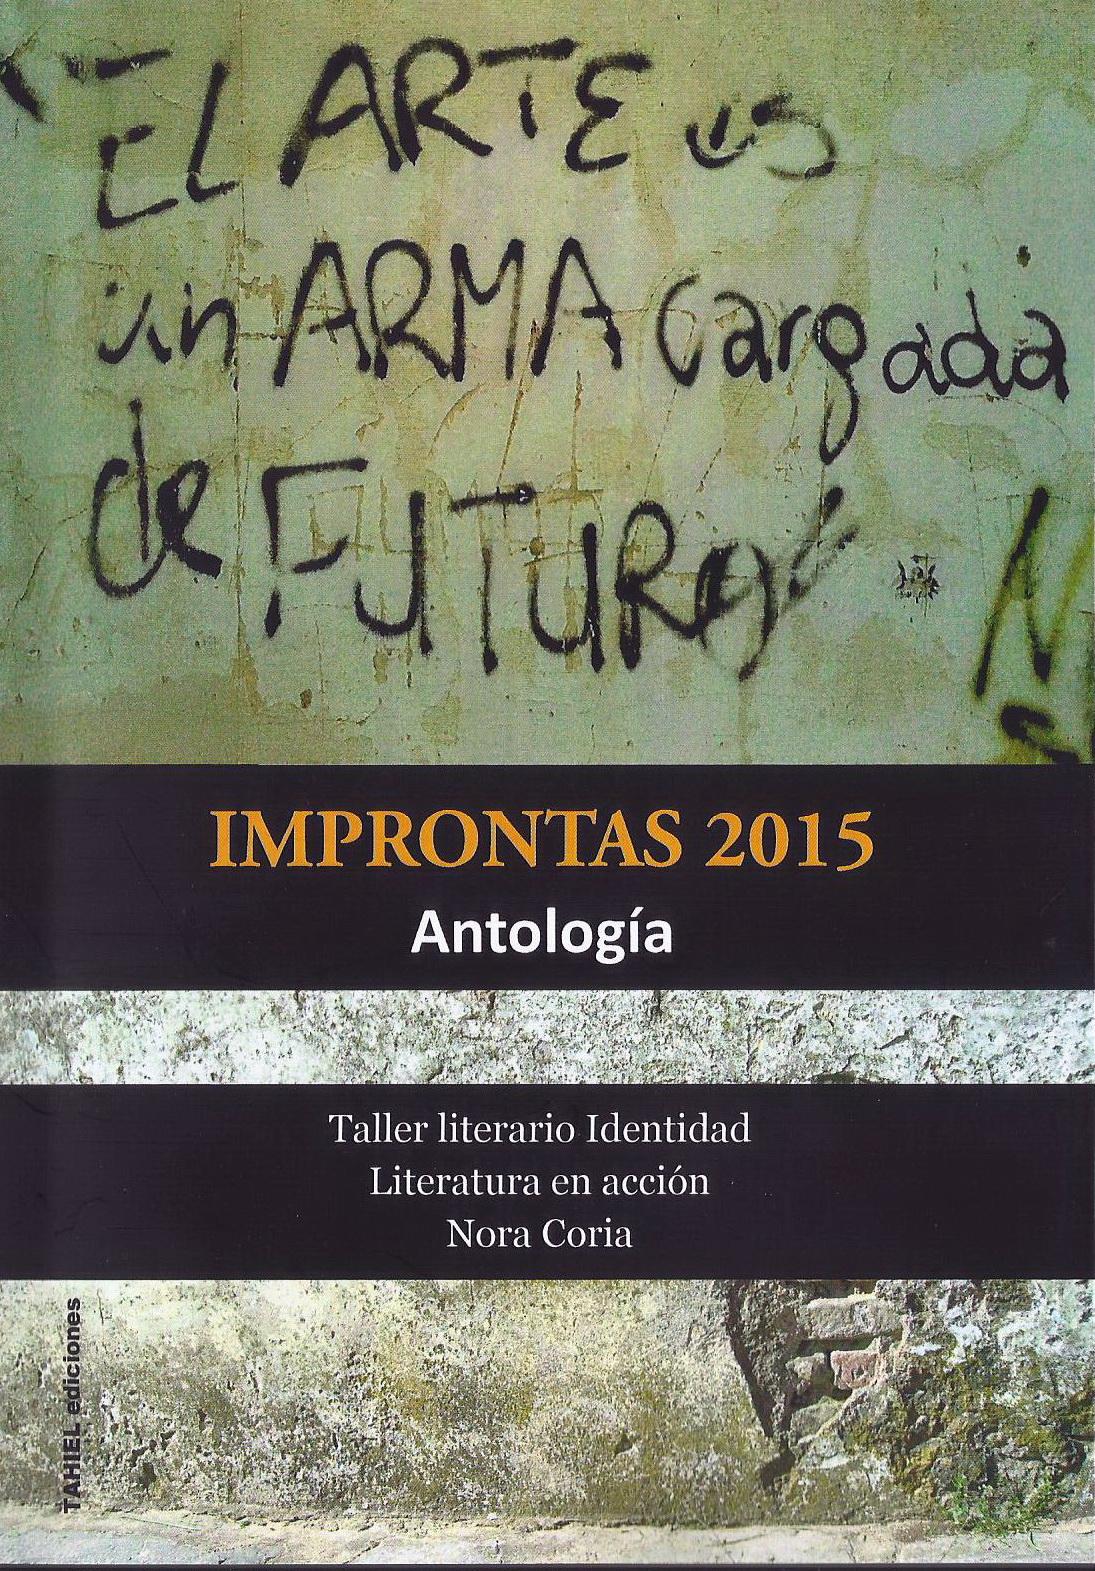 Improntas 2015